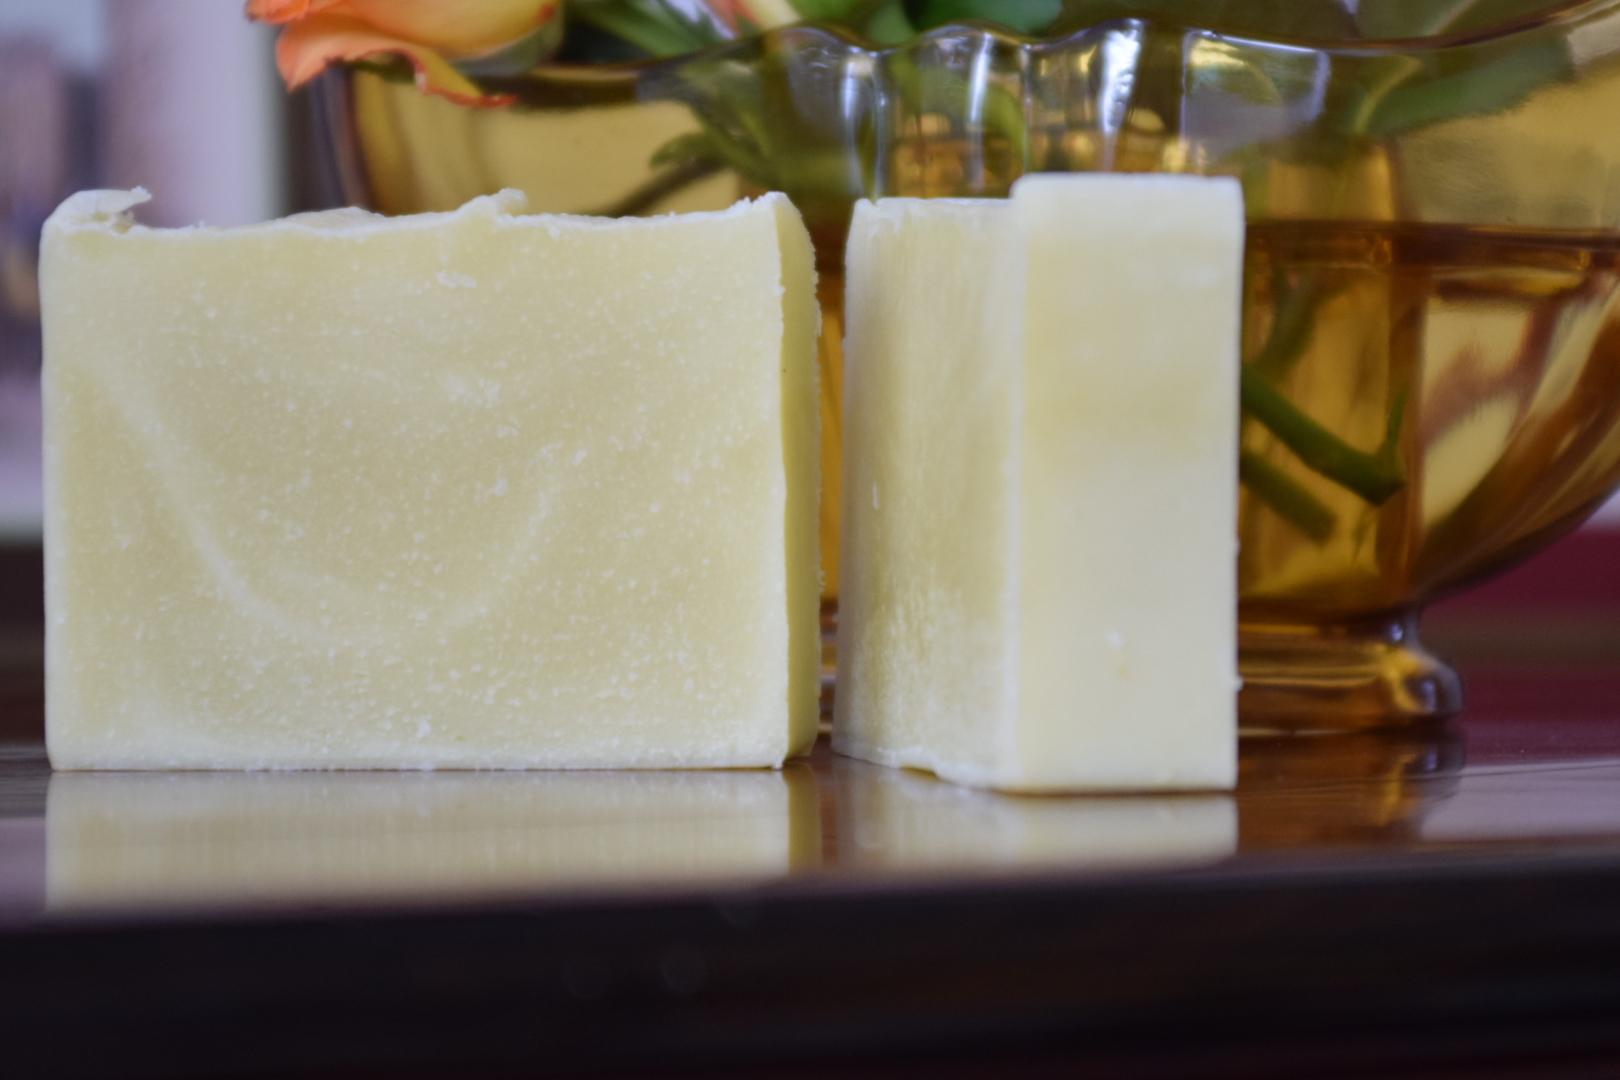 peppermint orange aromatherapy soap artisanal